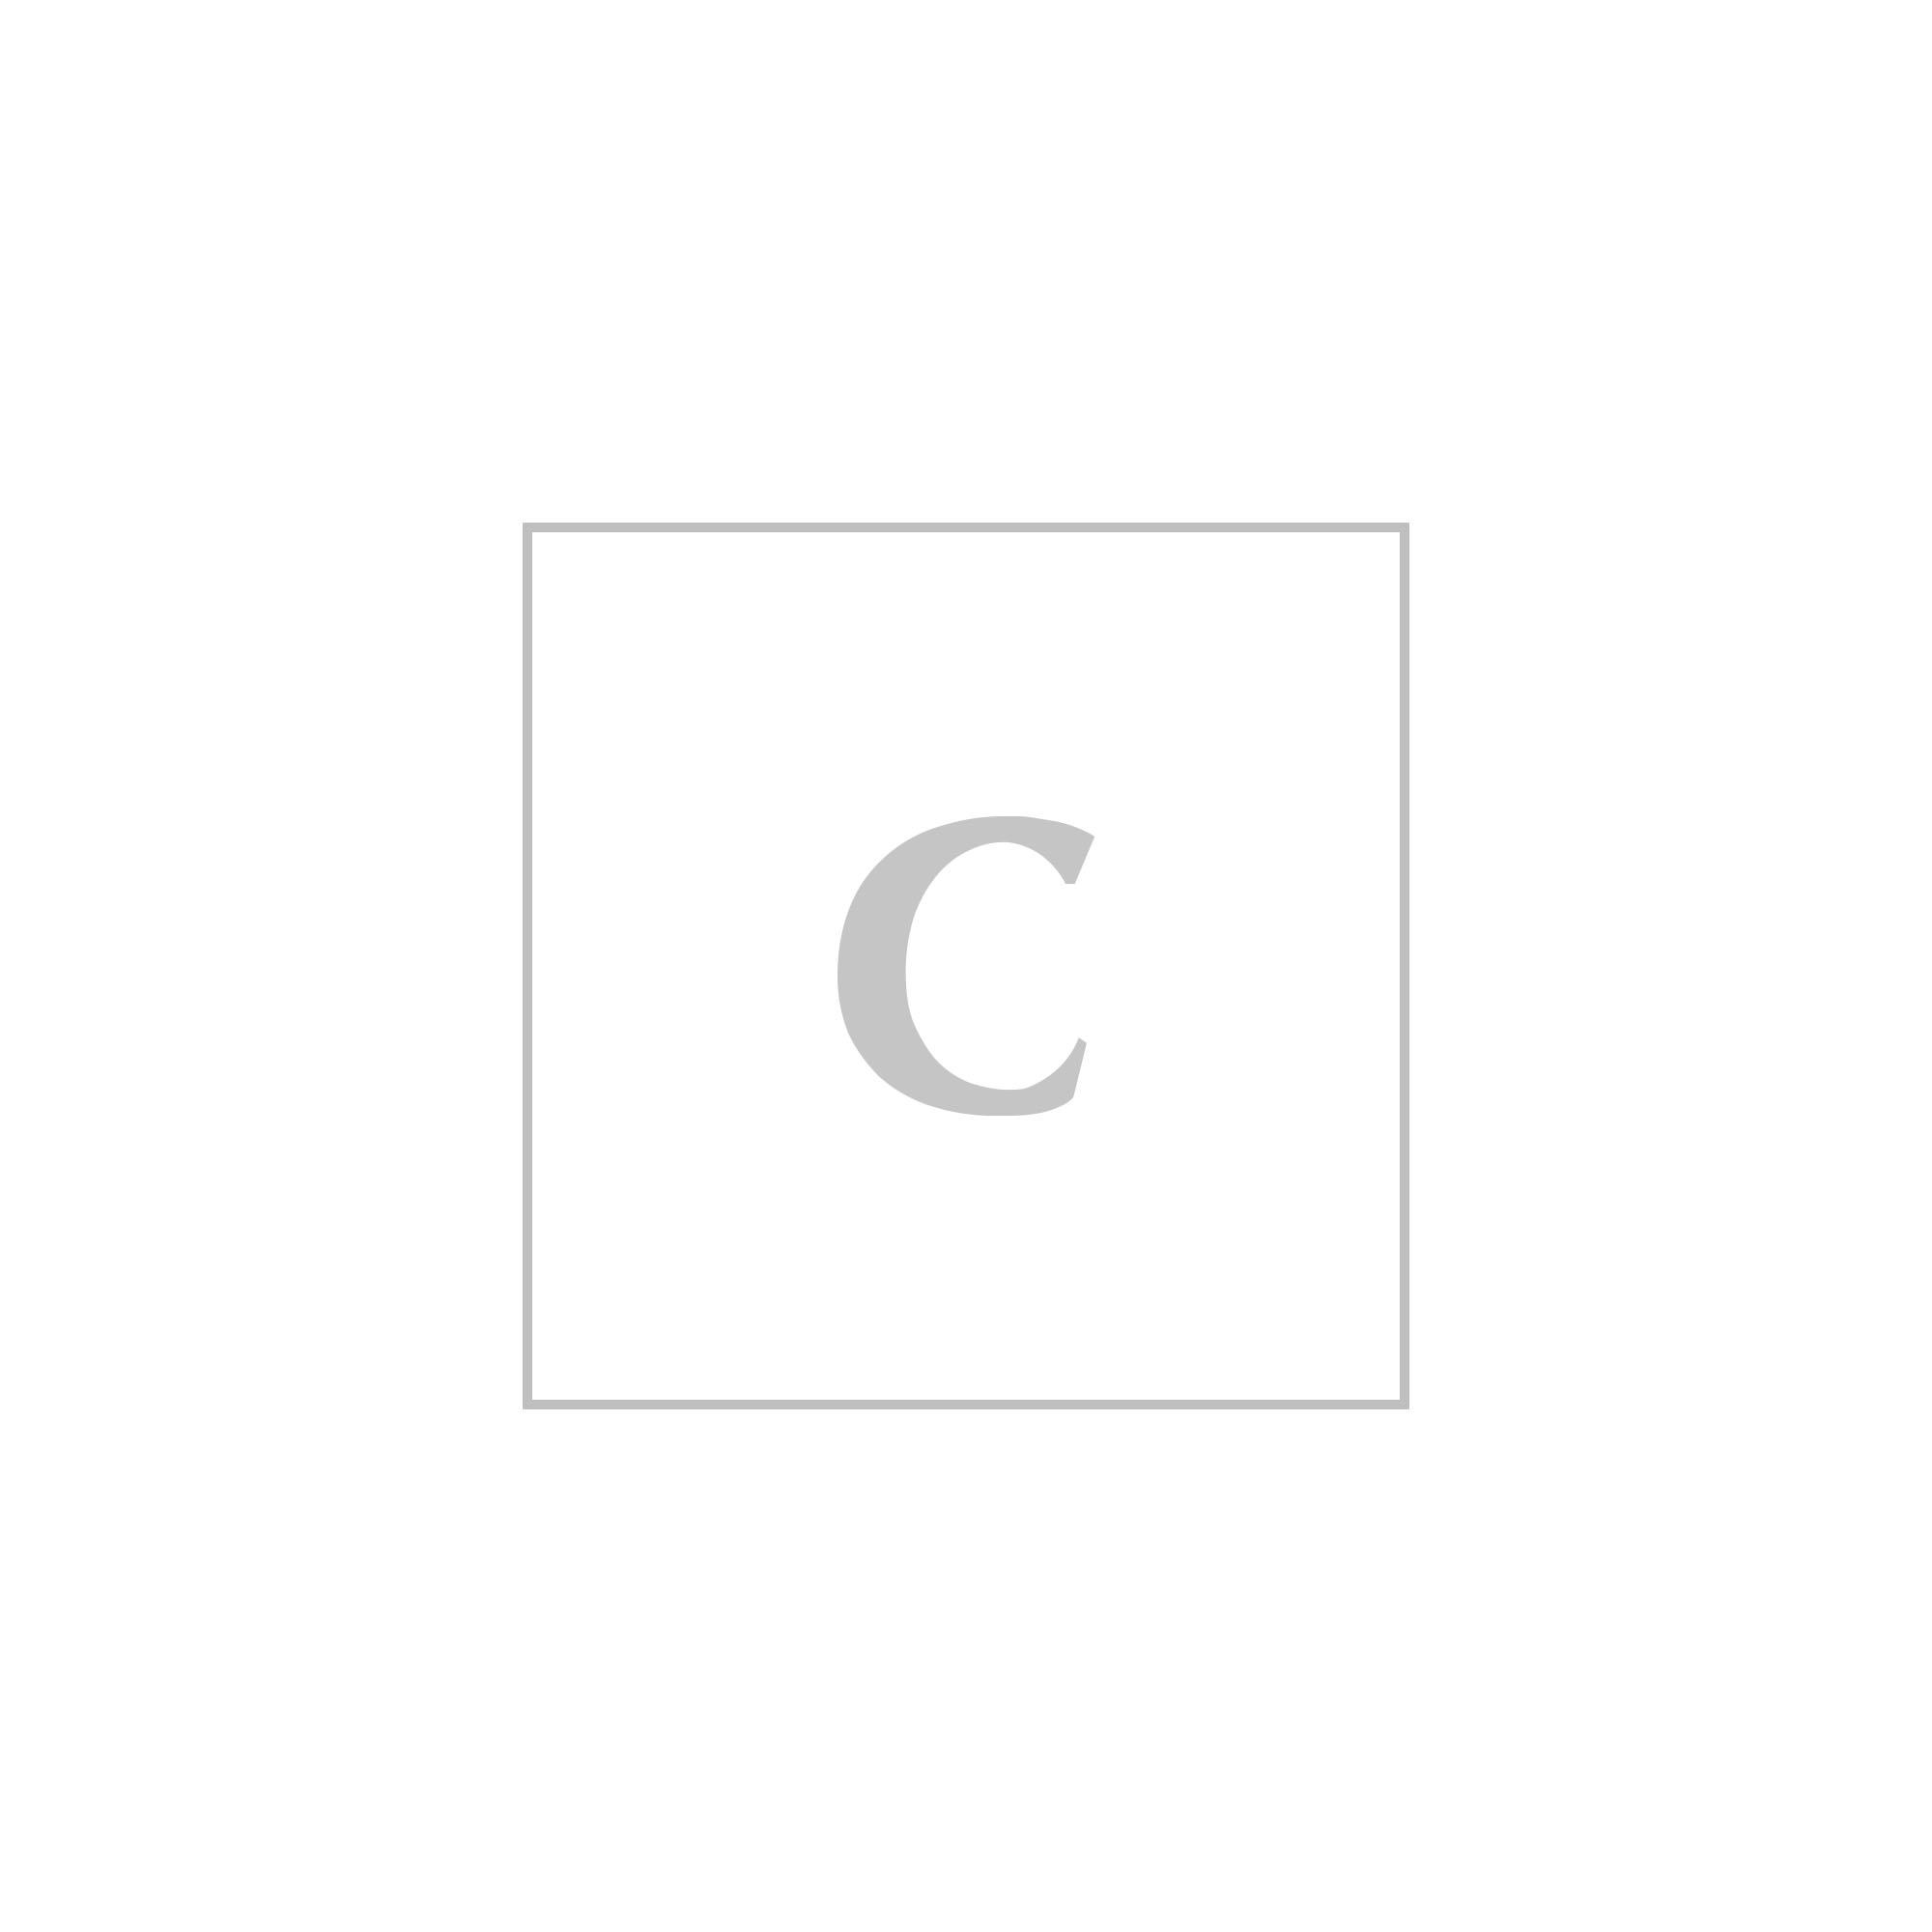 Dolce & gabbana cross brooch